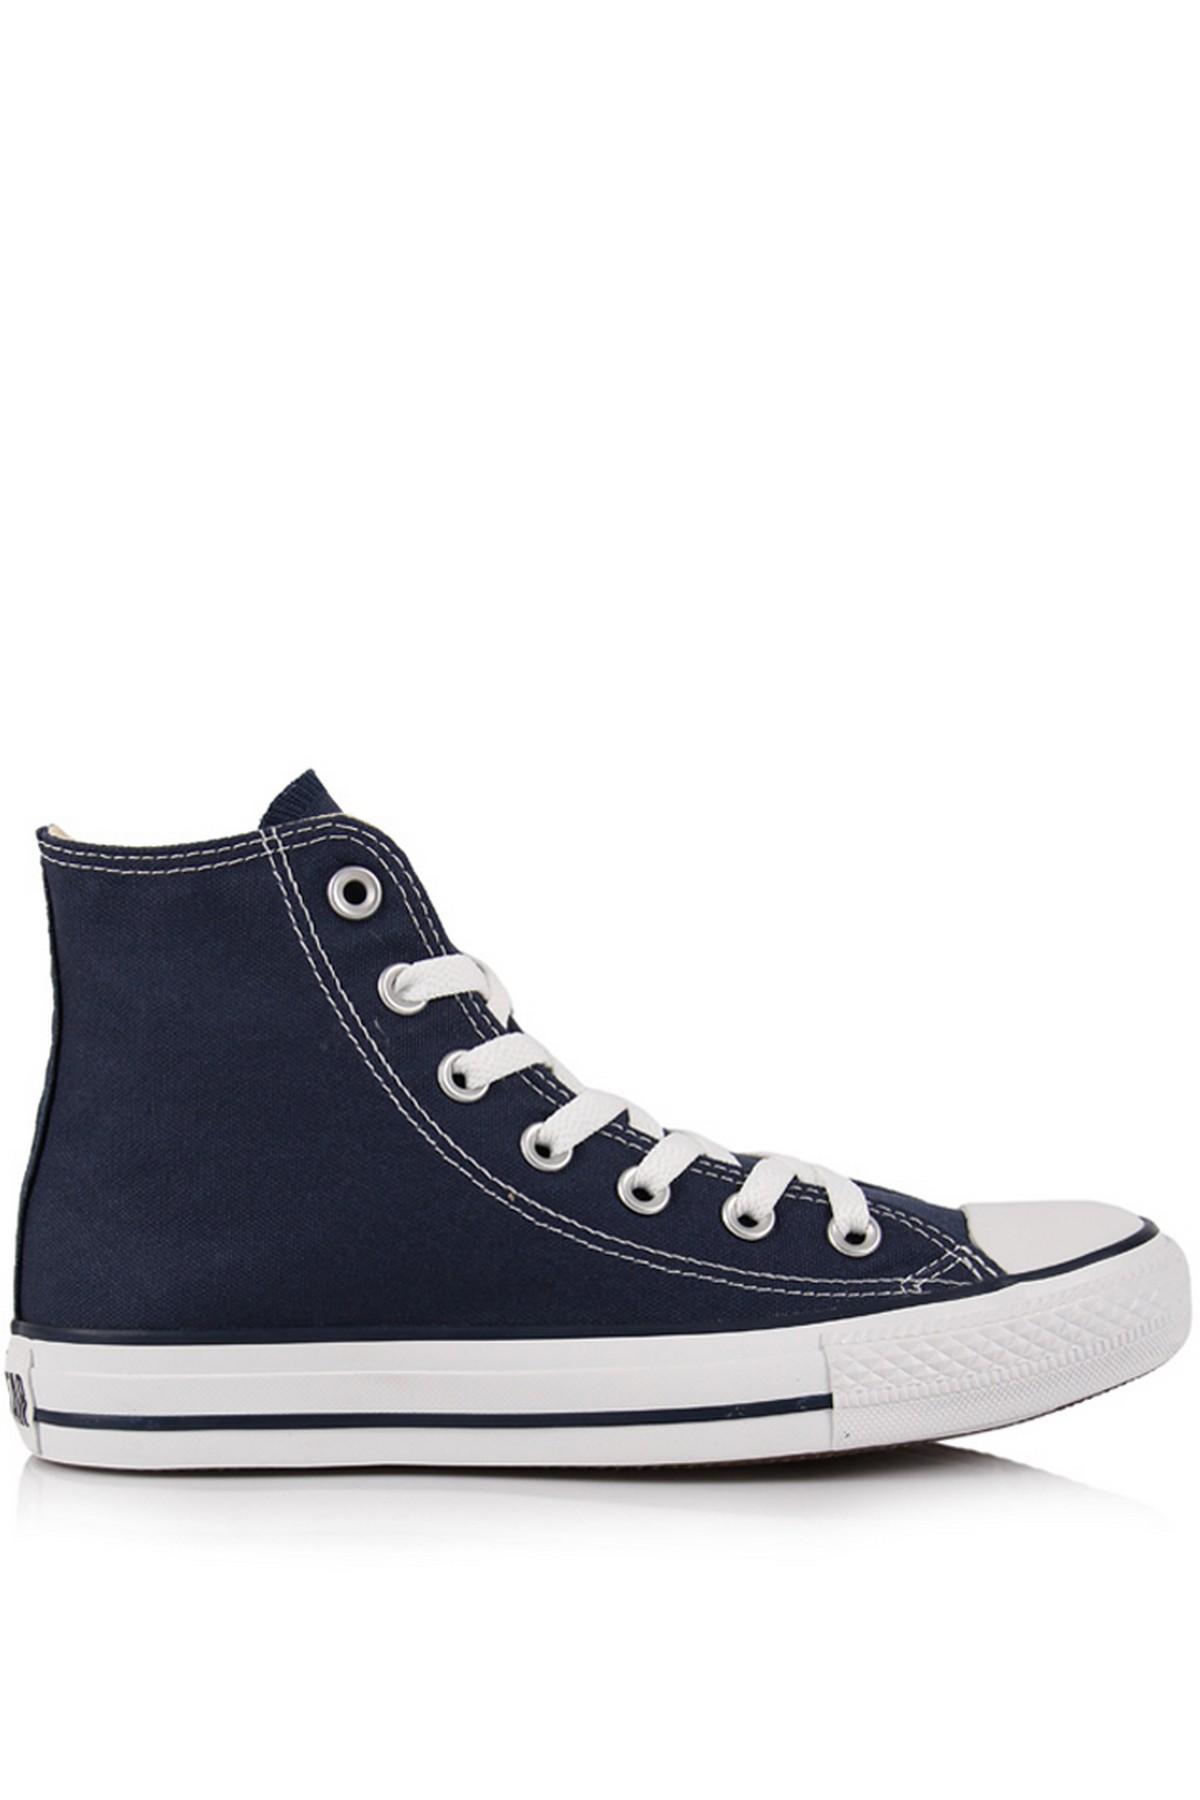 Converse Chuck Taylor All Star Ayakkabı Lacivert Renk (M9622C)